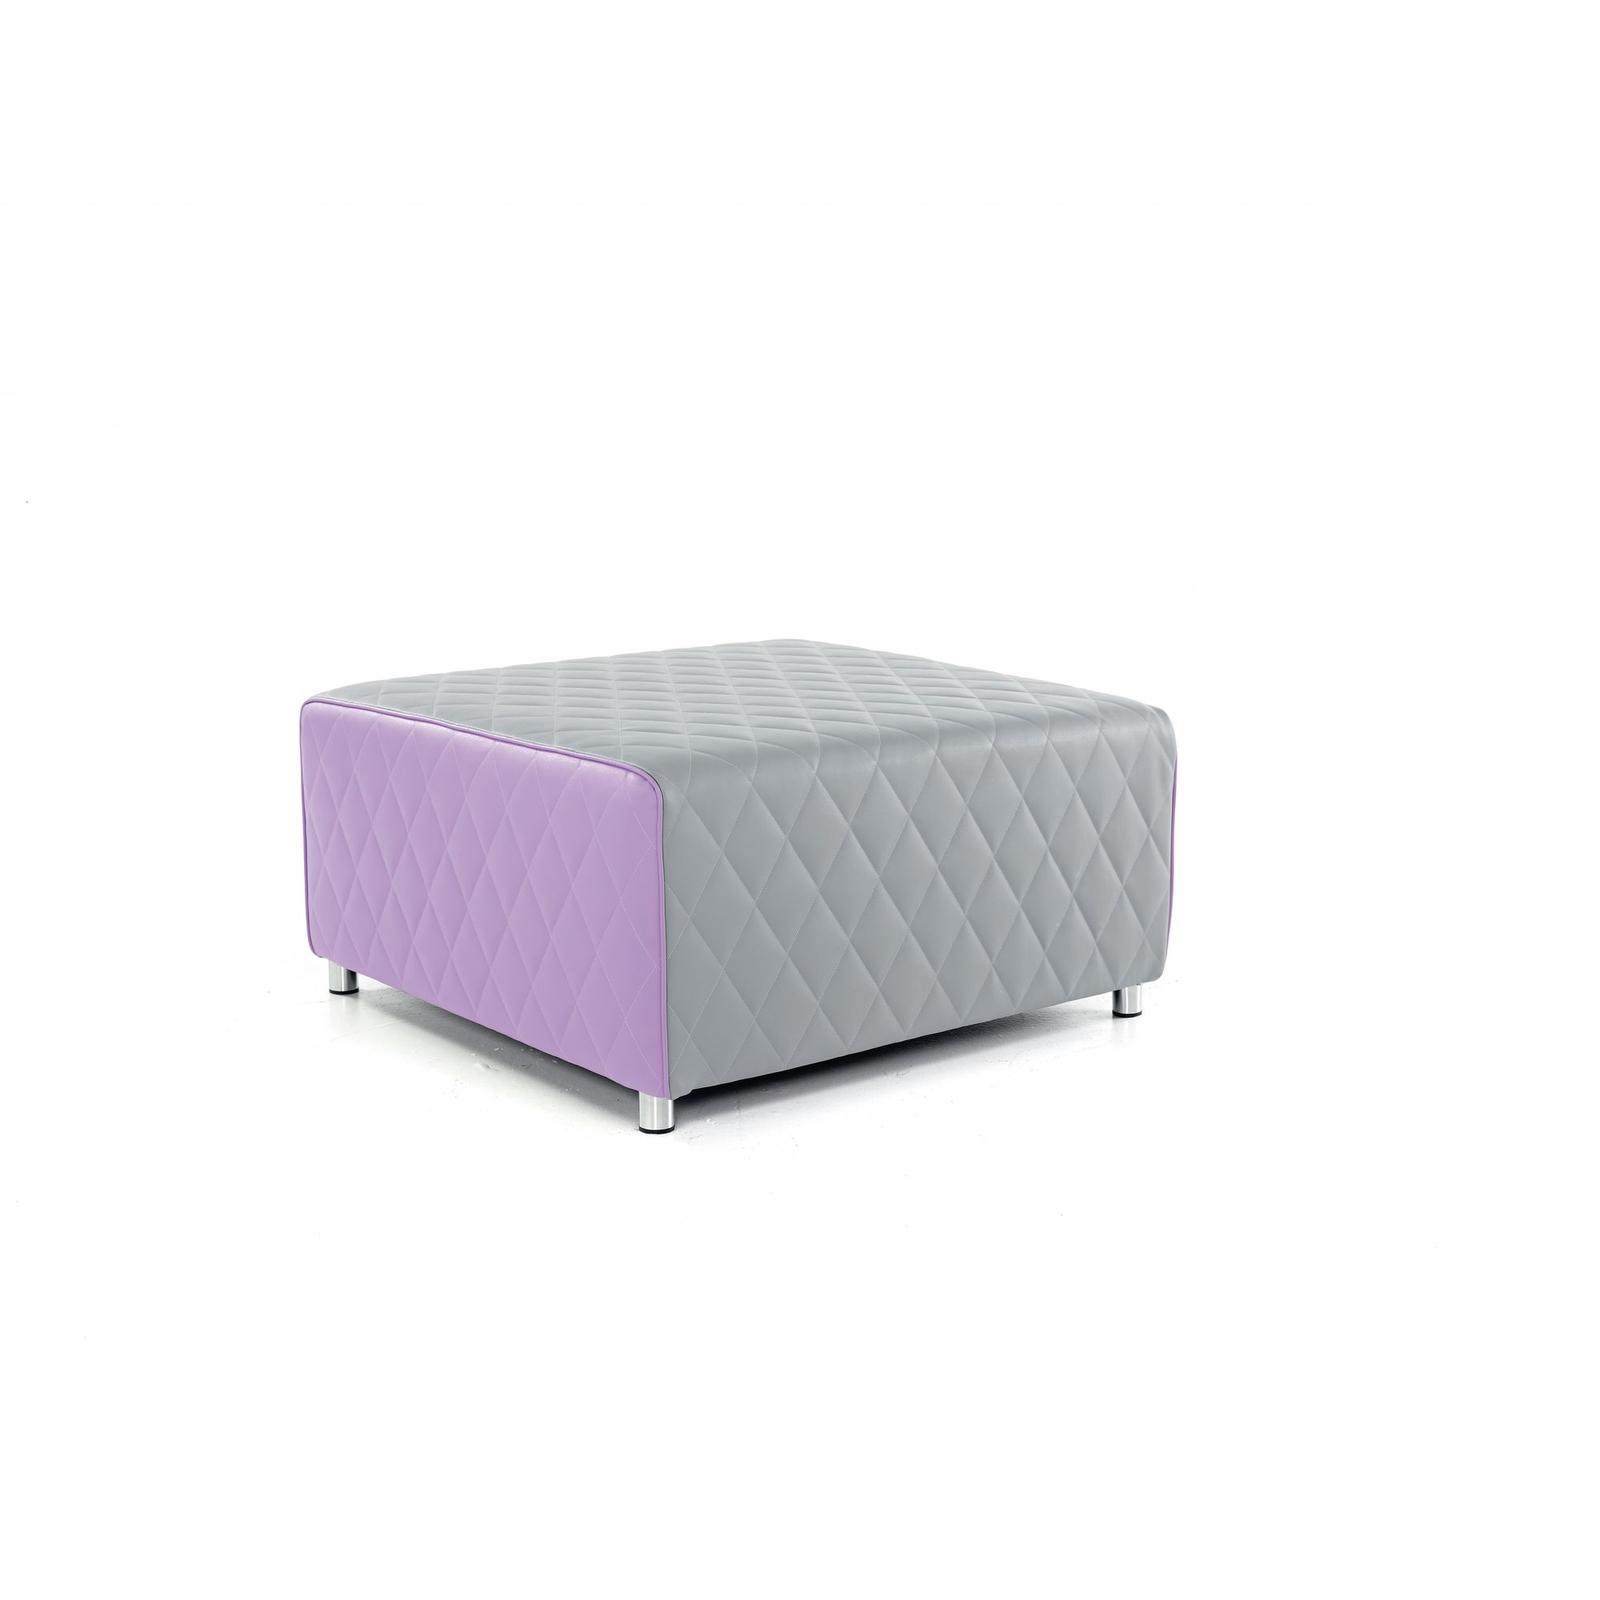 Square Breakout Seat 4 Person - Grey and Purple